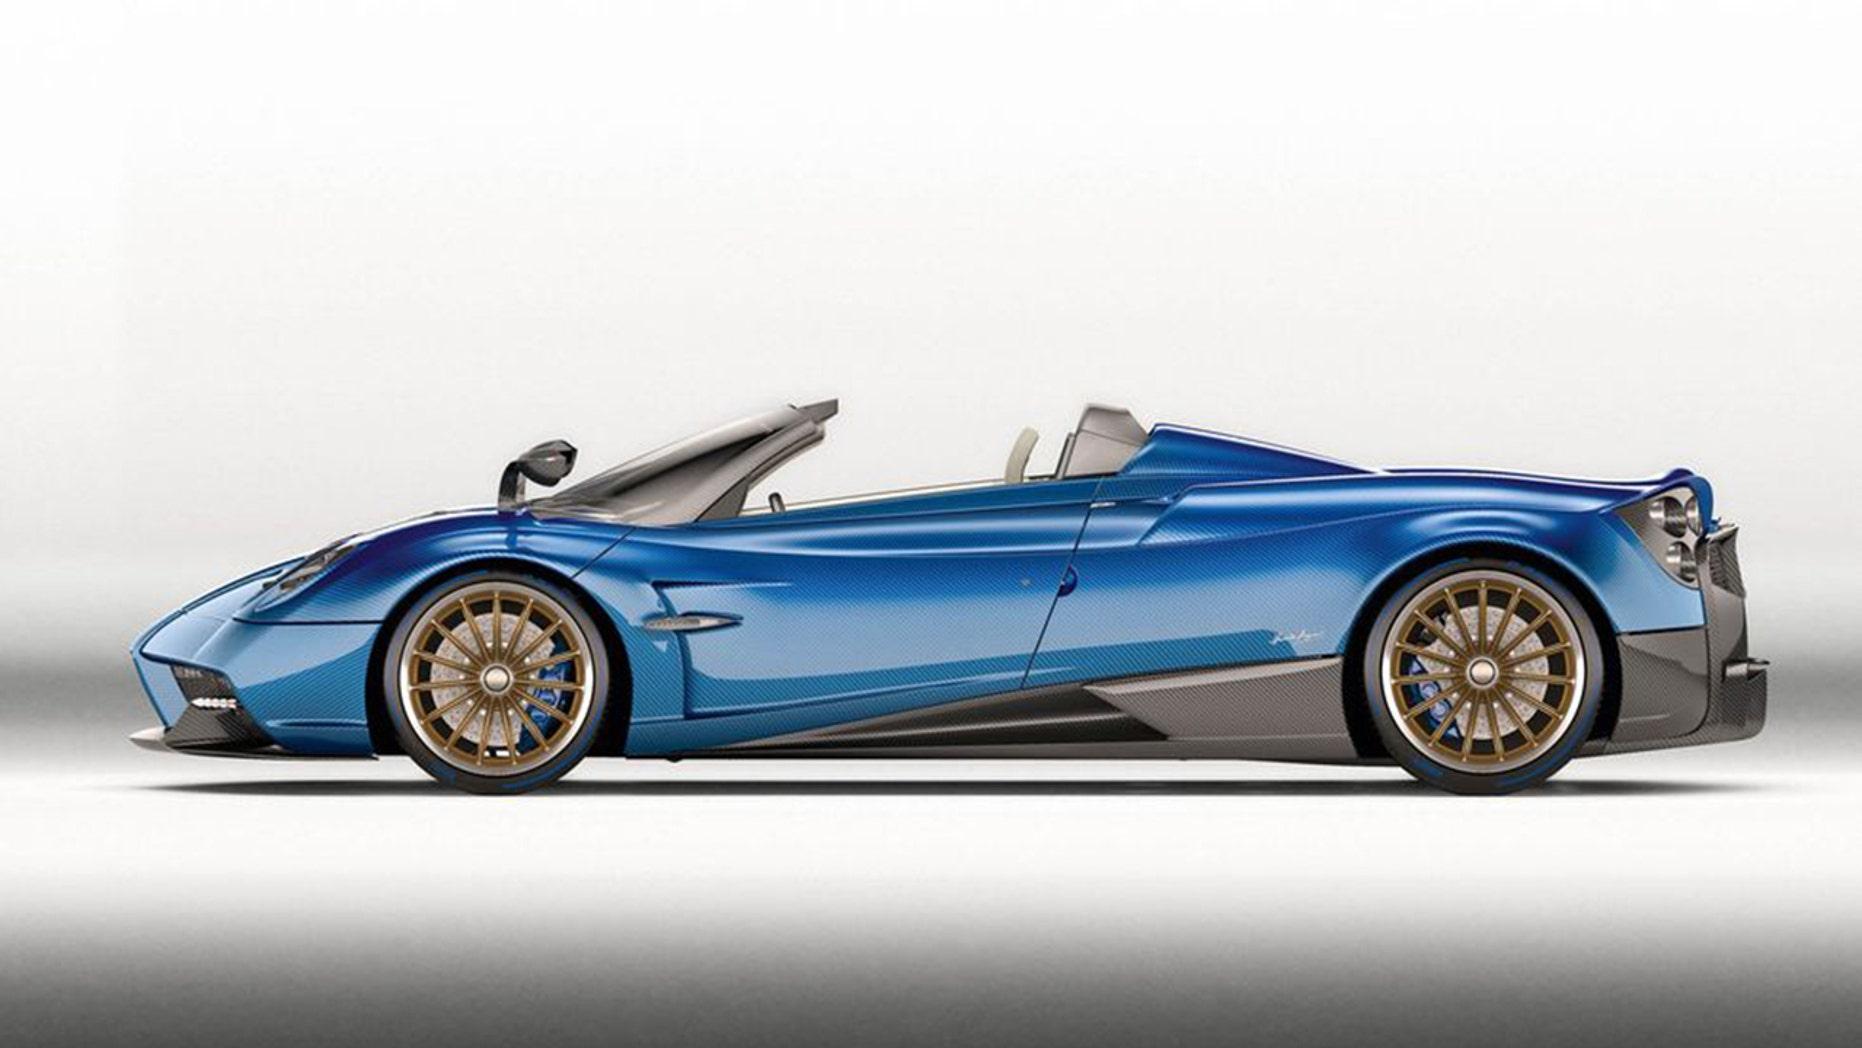 rare $3.4M sports car